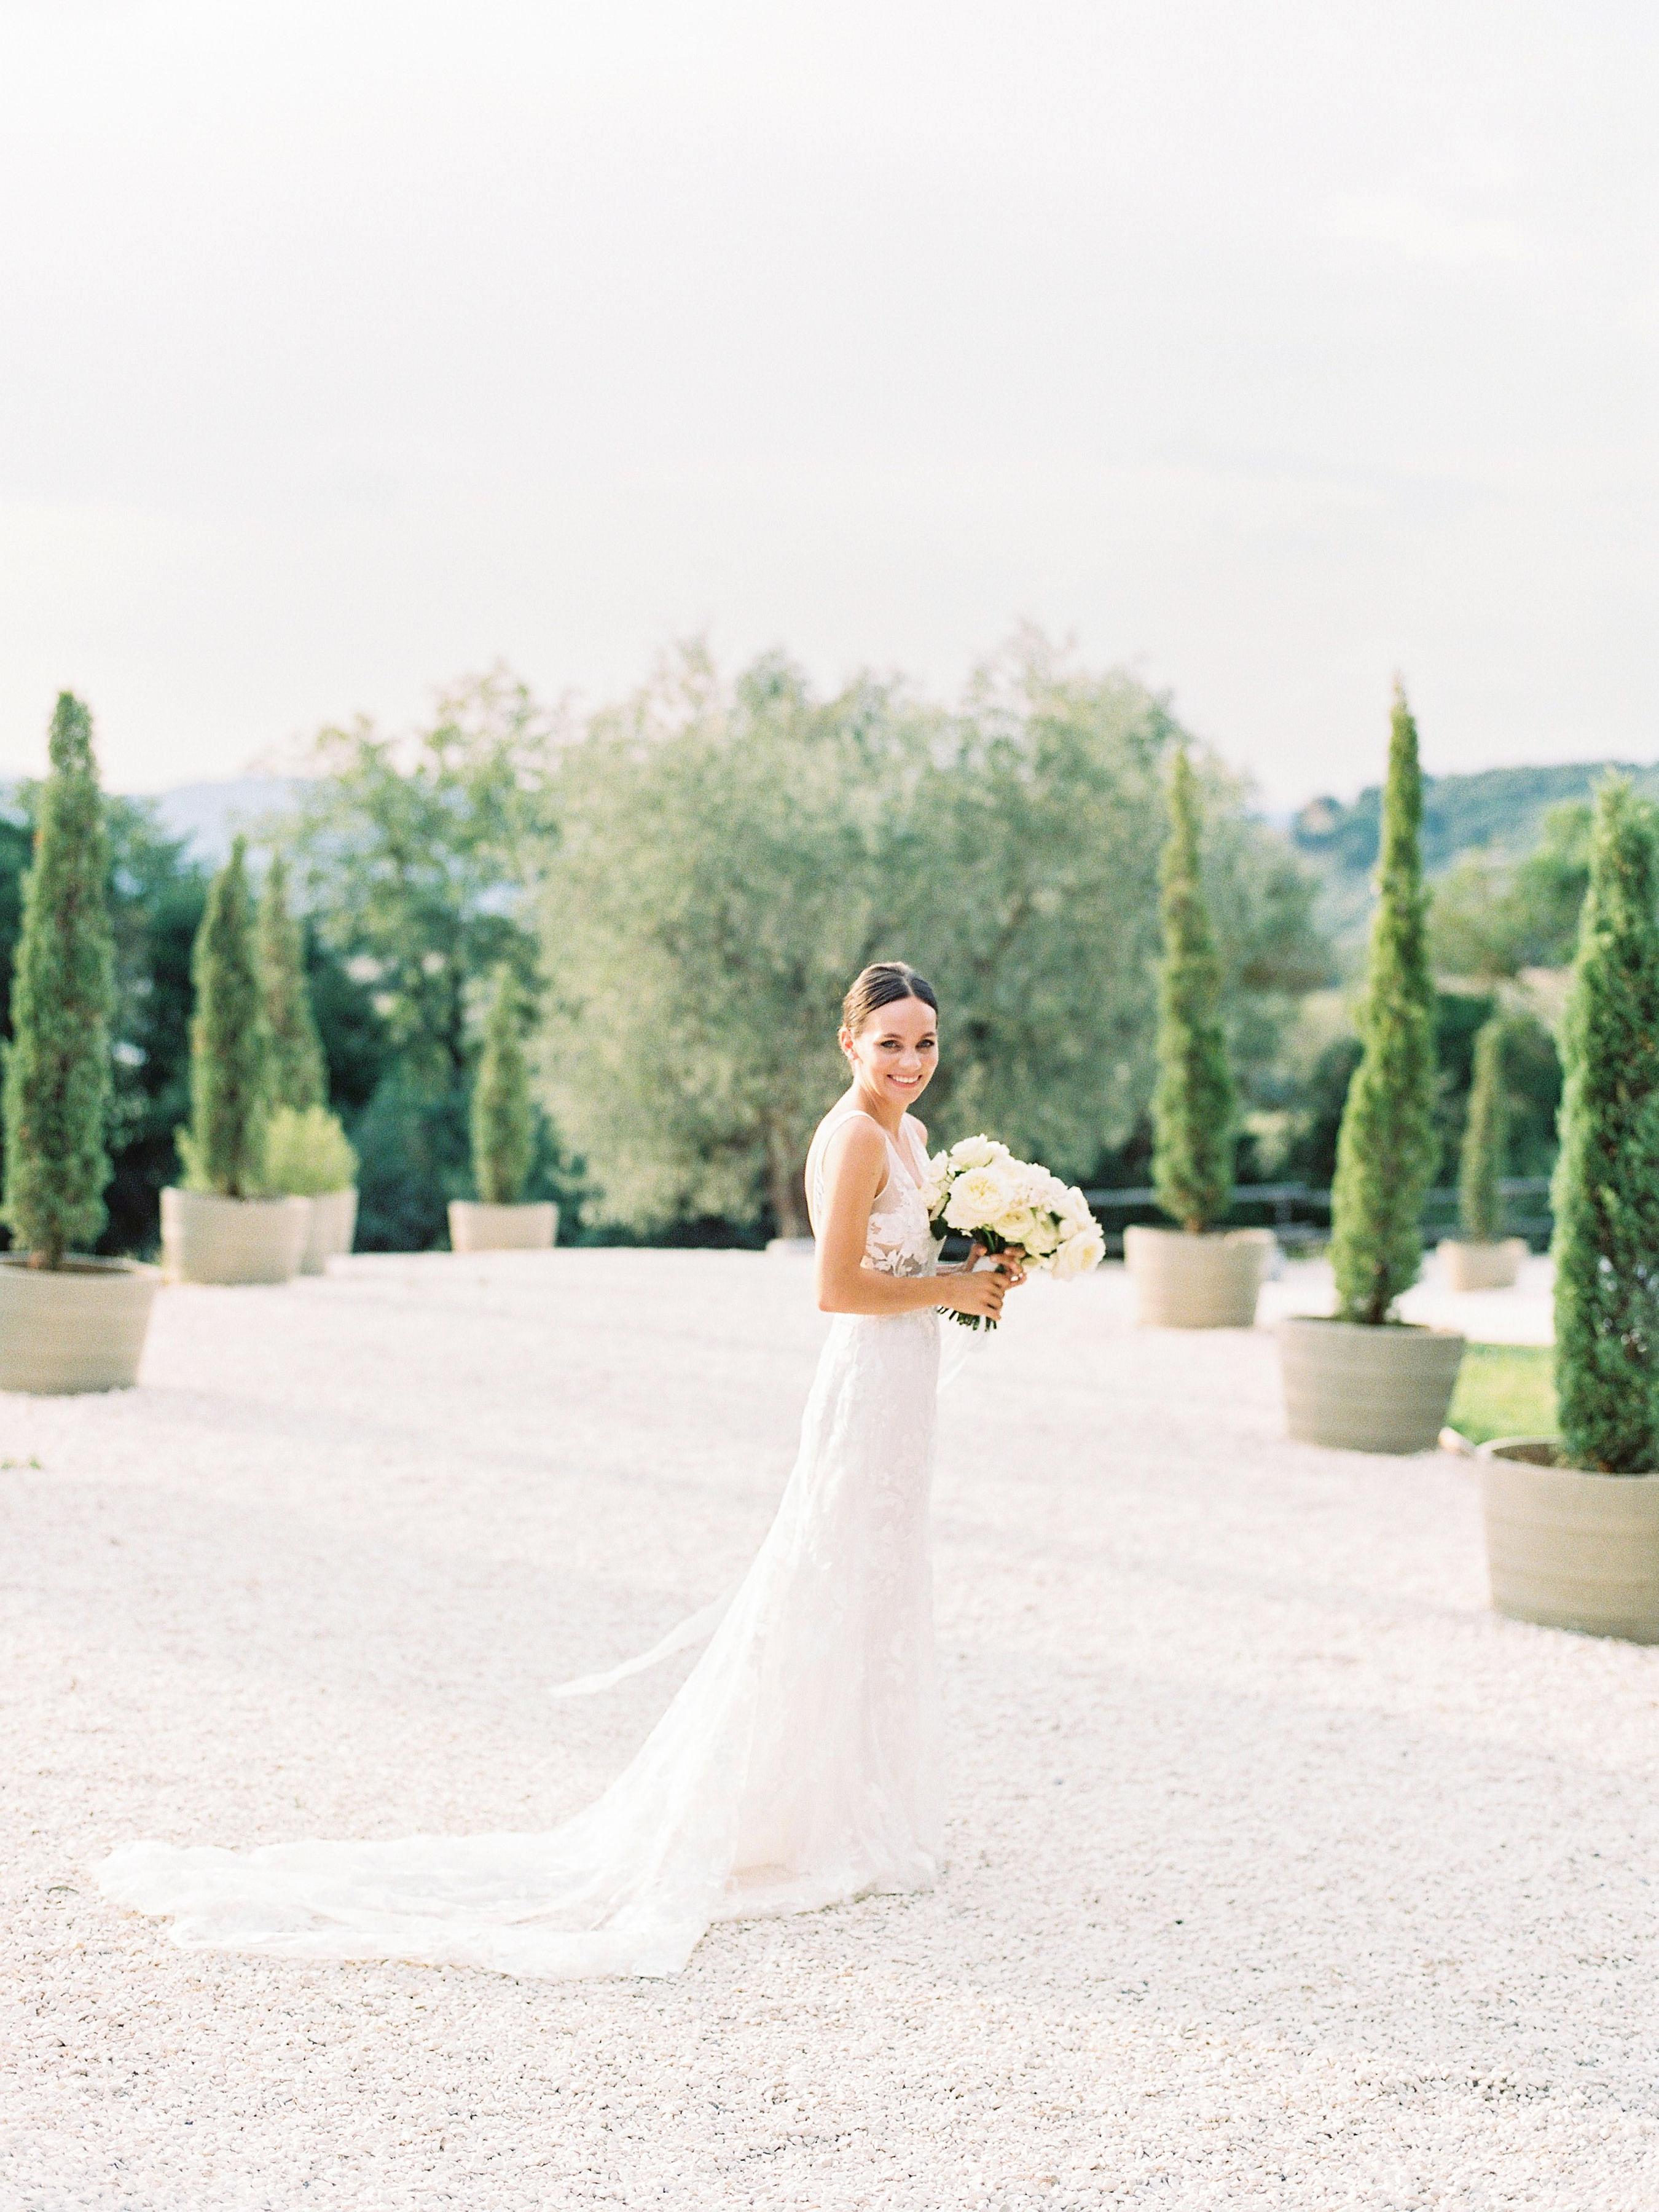 kseniya sadhir wedding italy bride outdoors